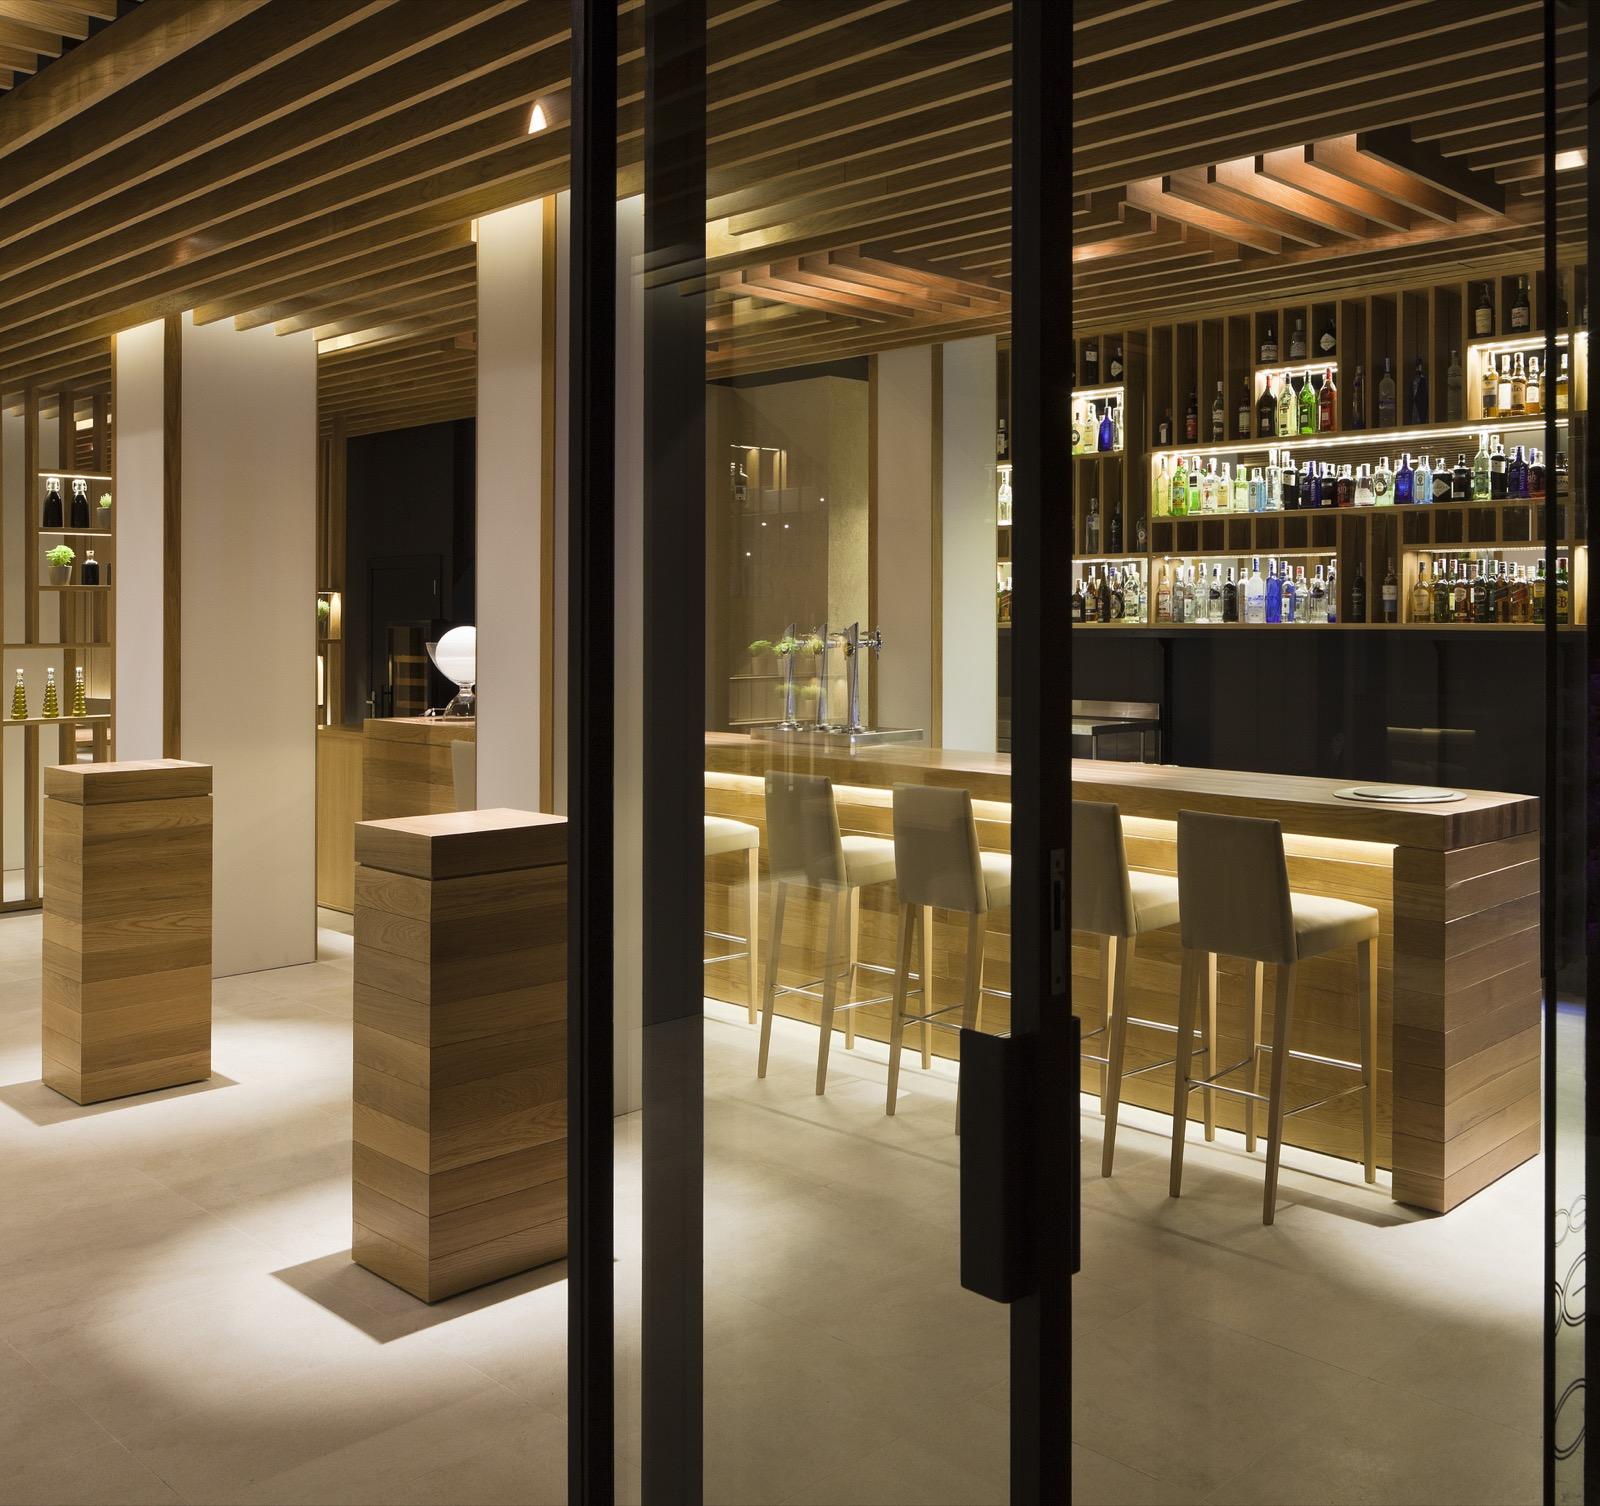 Besso restaurant mallorca interior design - Techos de madera interiores ...